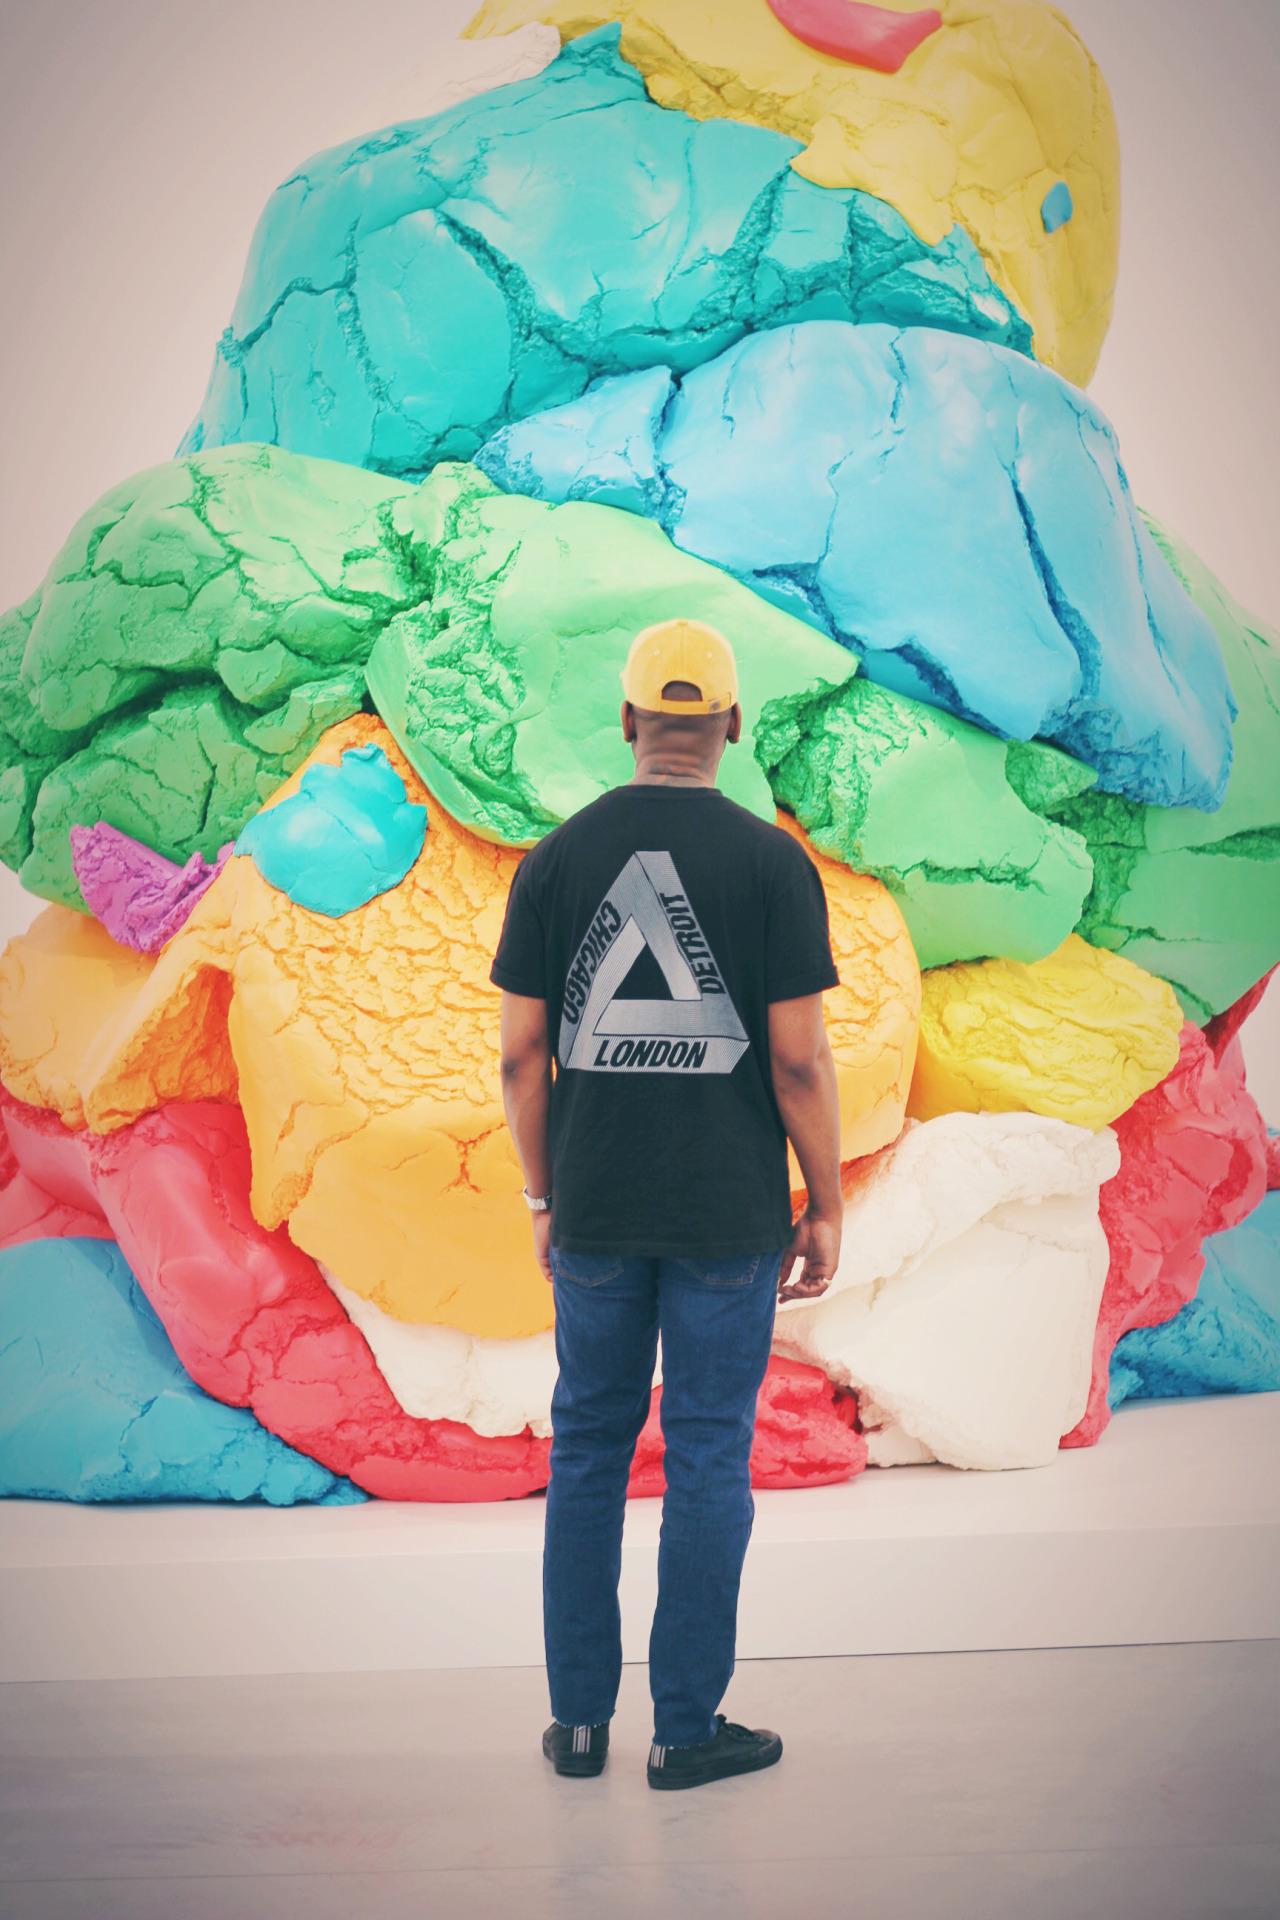 Me @ Newport St. Gallery (London) 2016